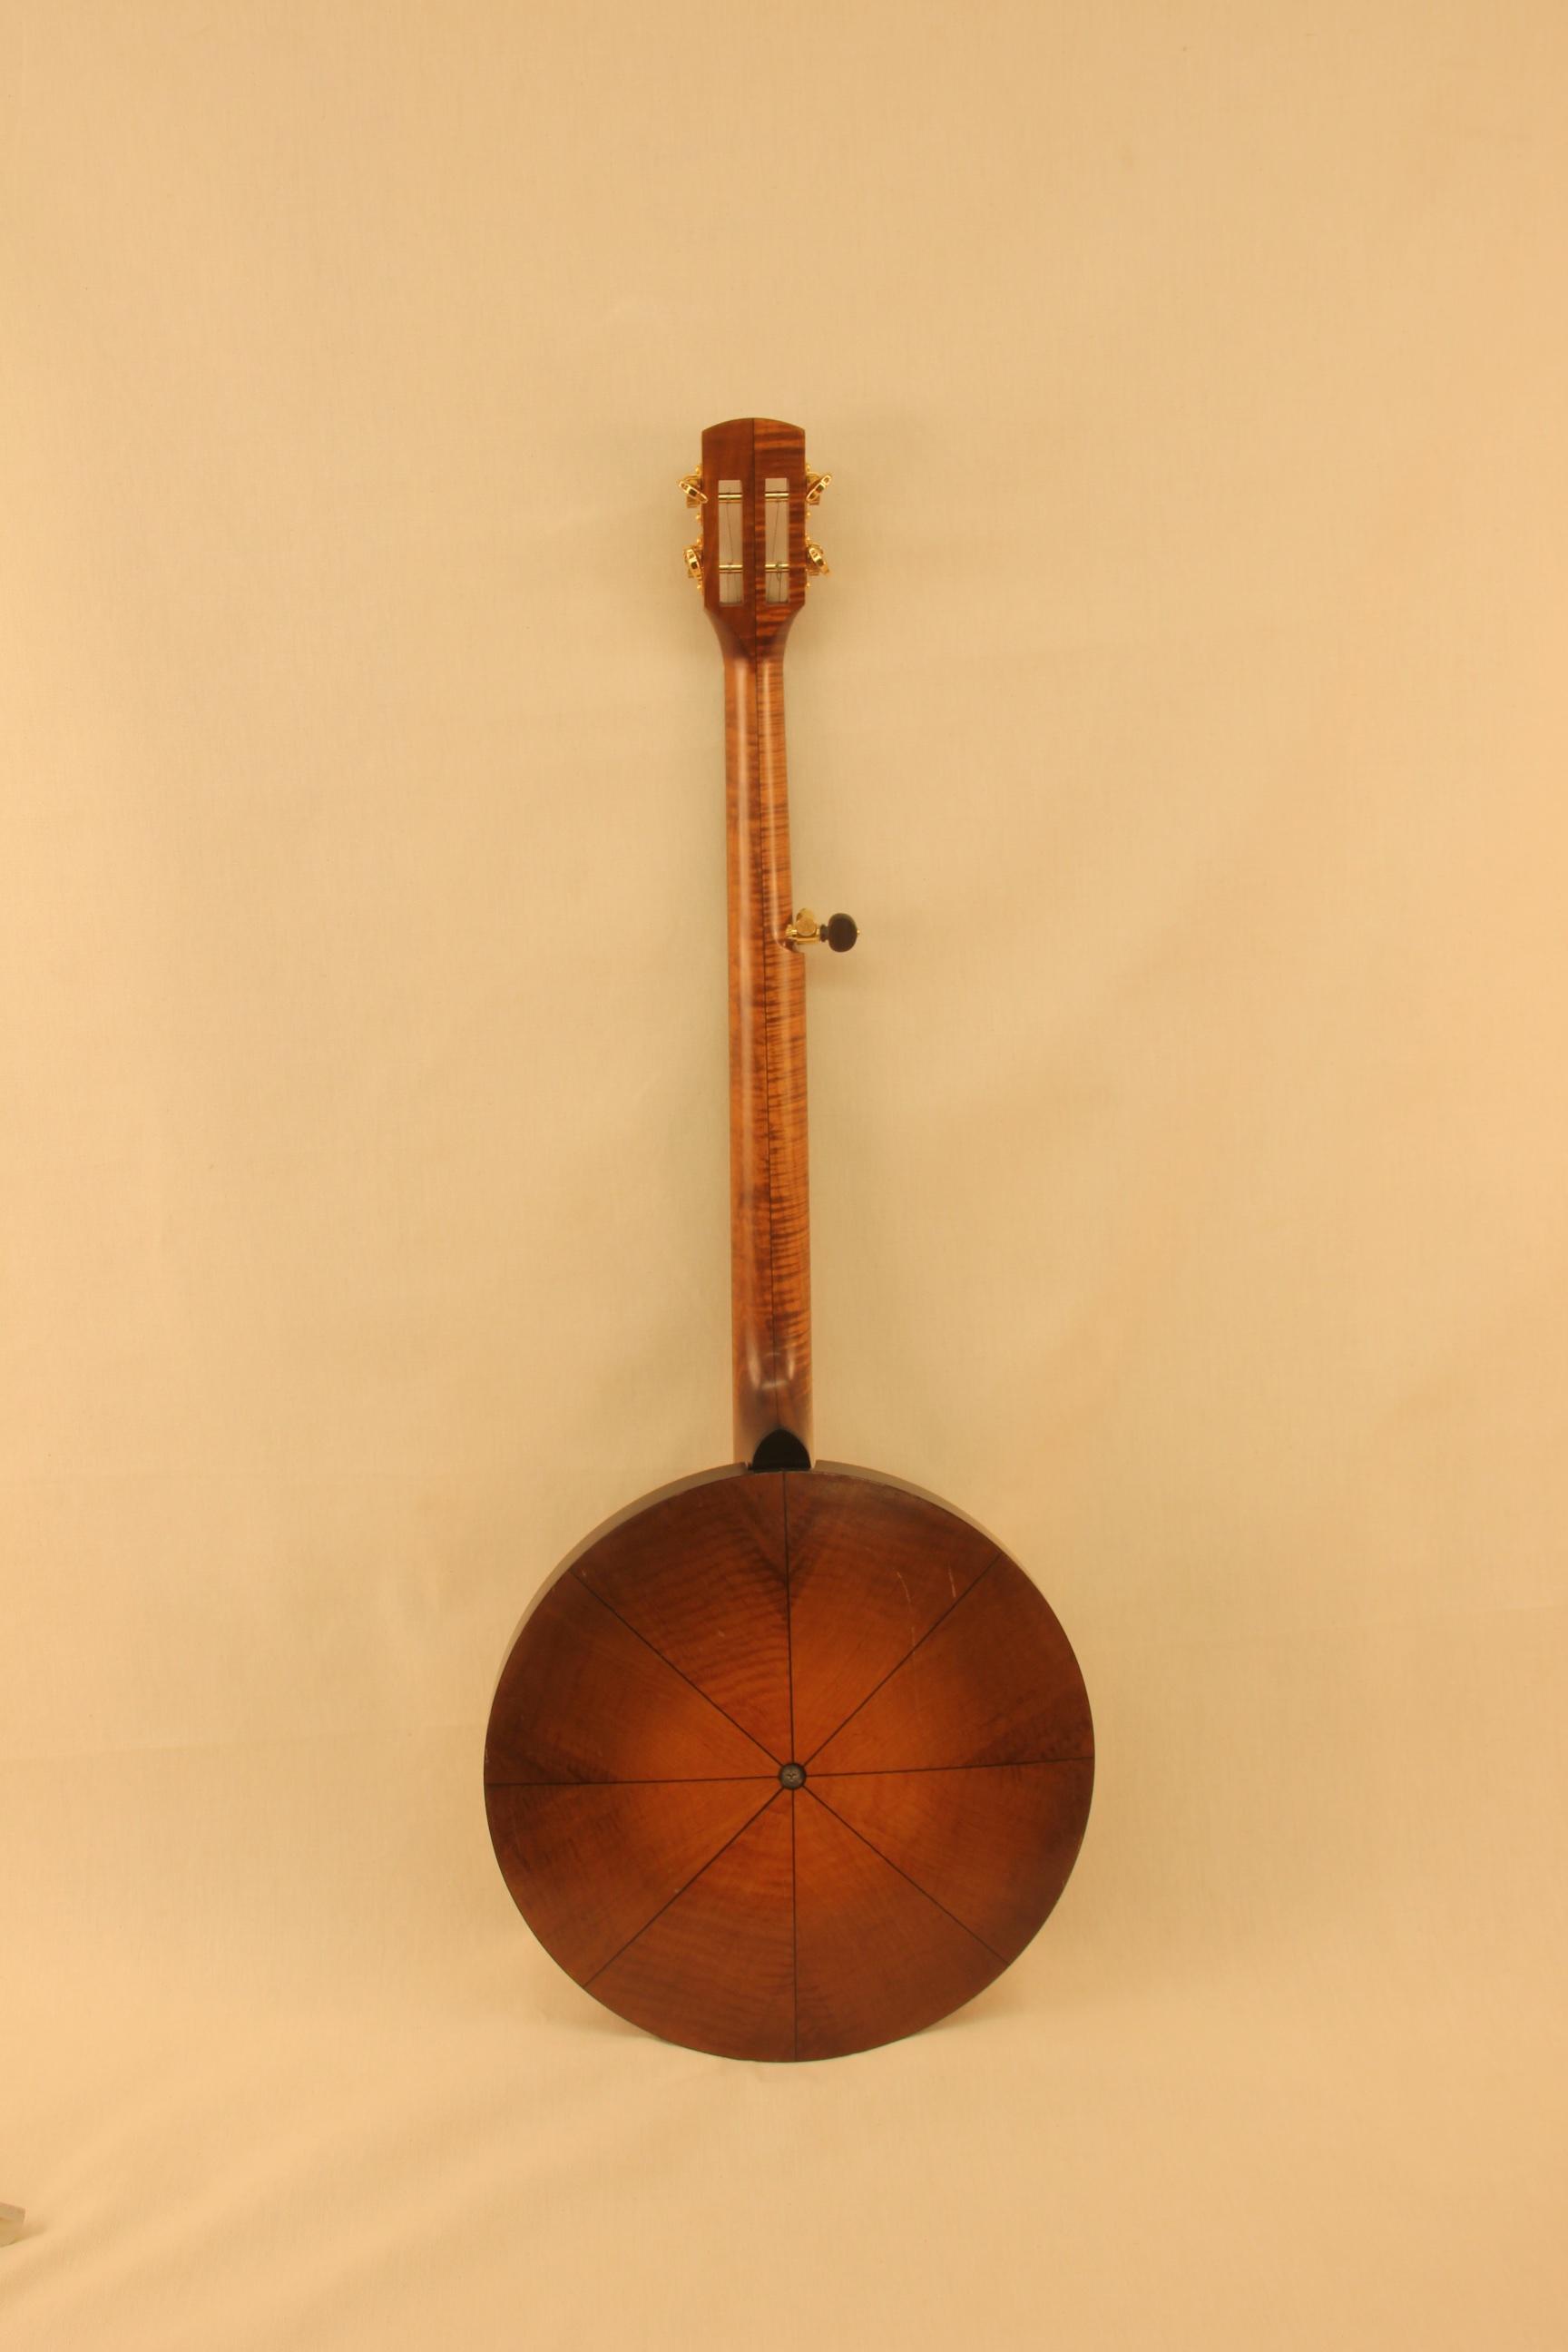 Vega Tubaphone Slothead Banjo Seeders Instruments